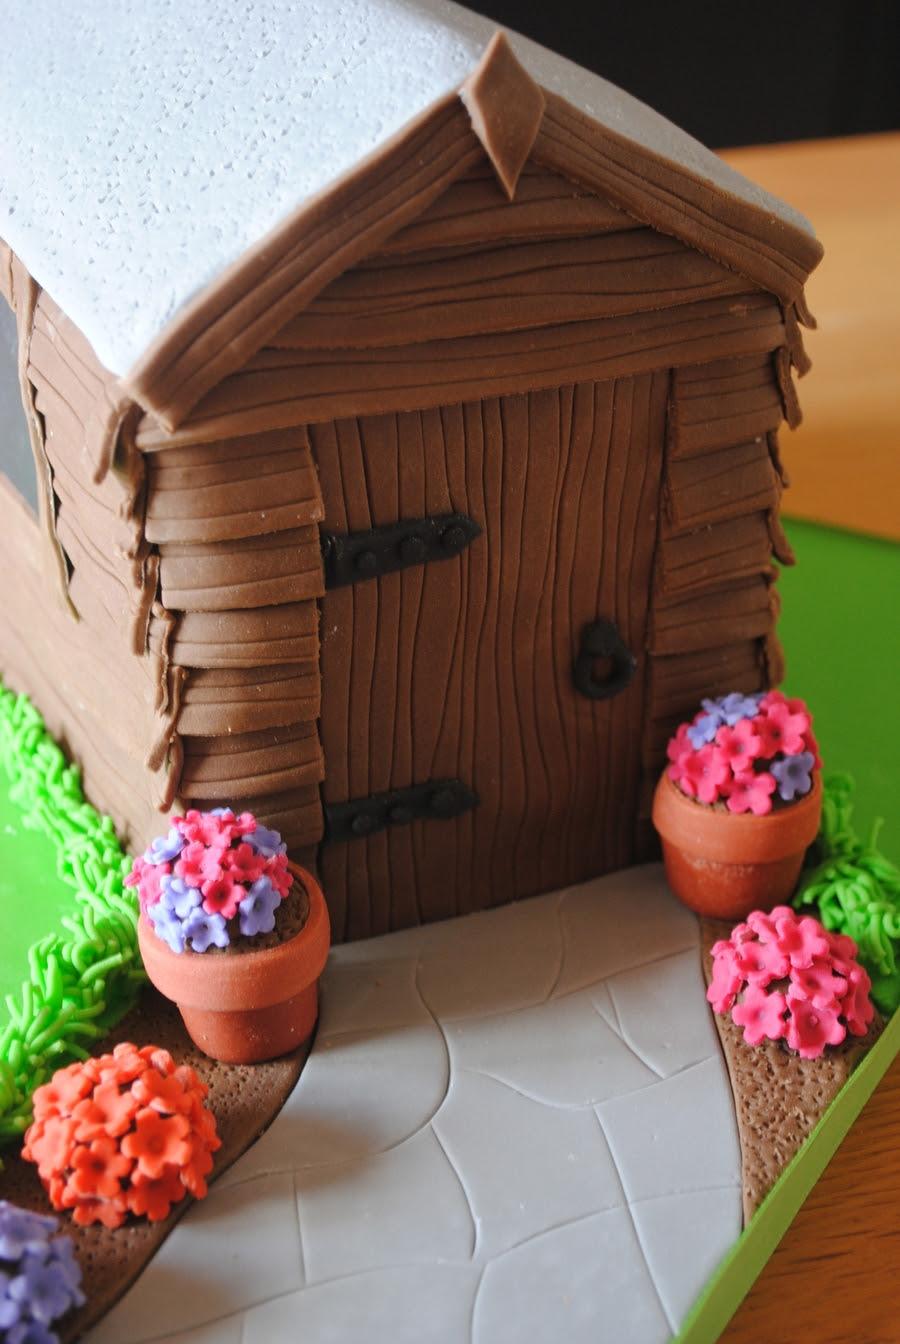 Garden Shed Cake - CakeCentral.com